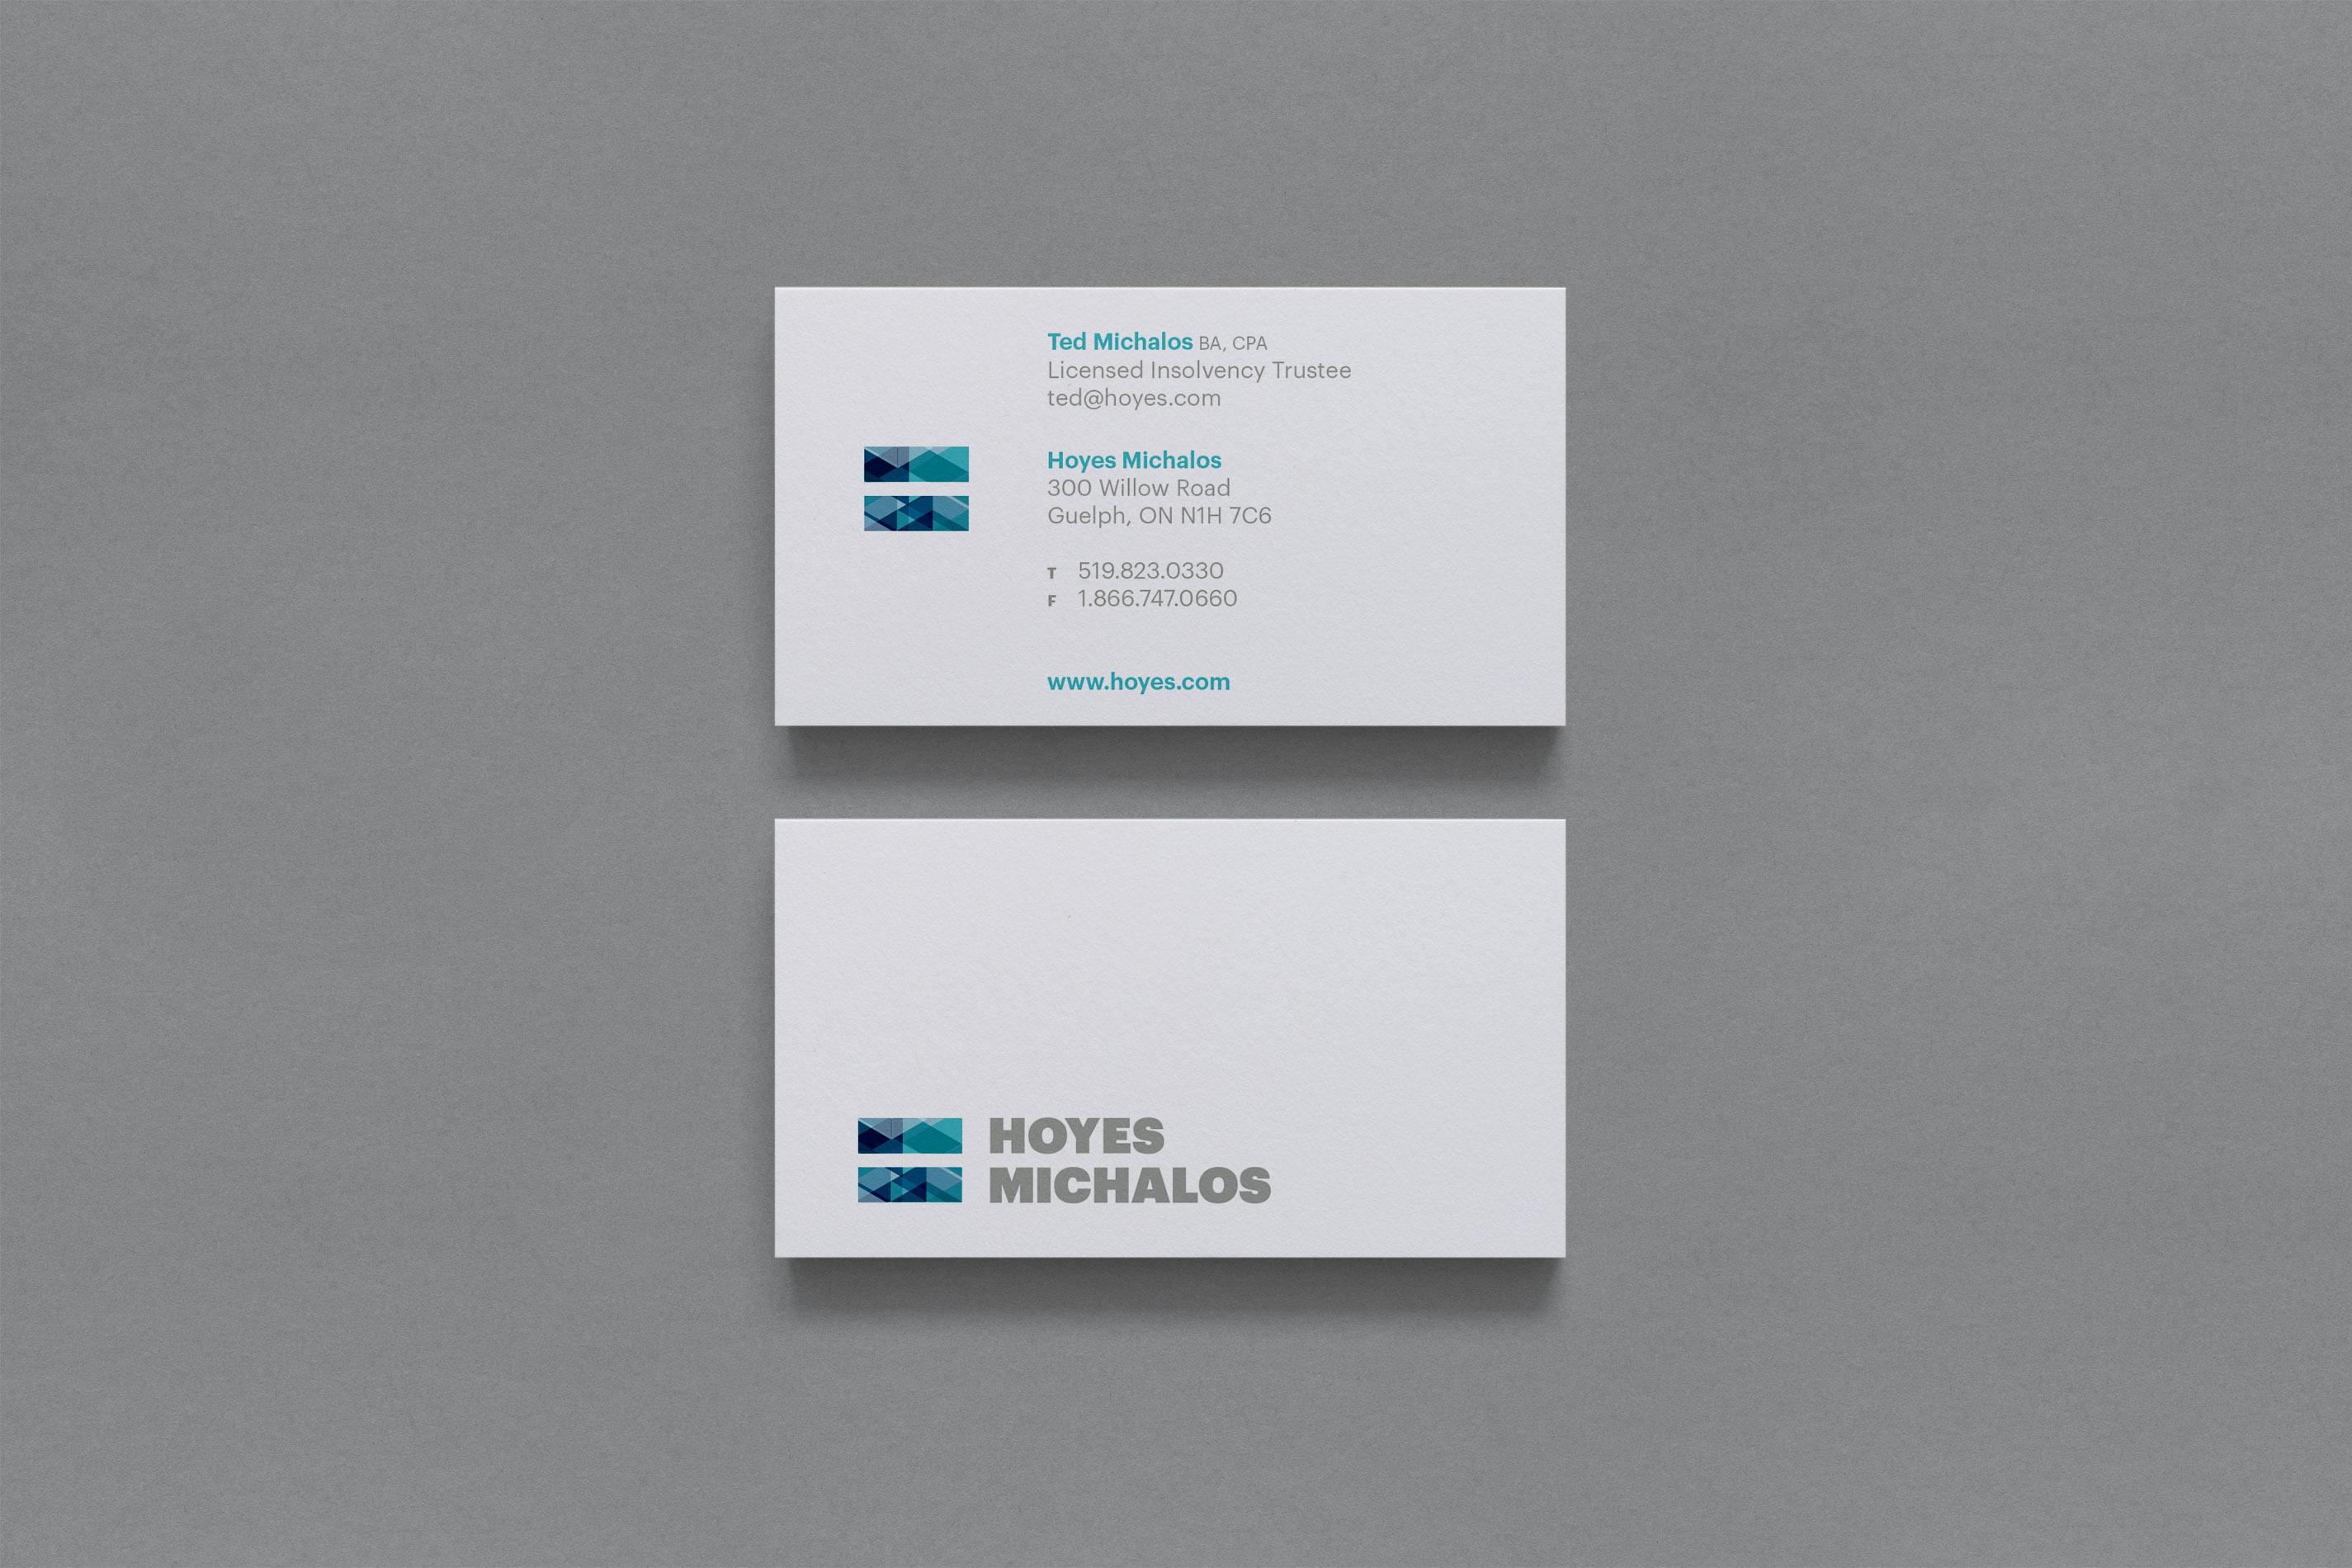 HoyesMichalos_Card